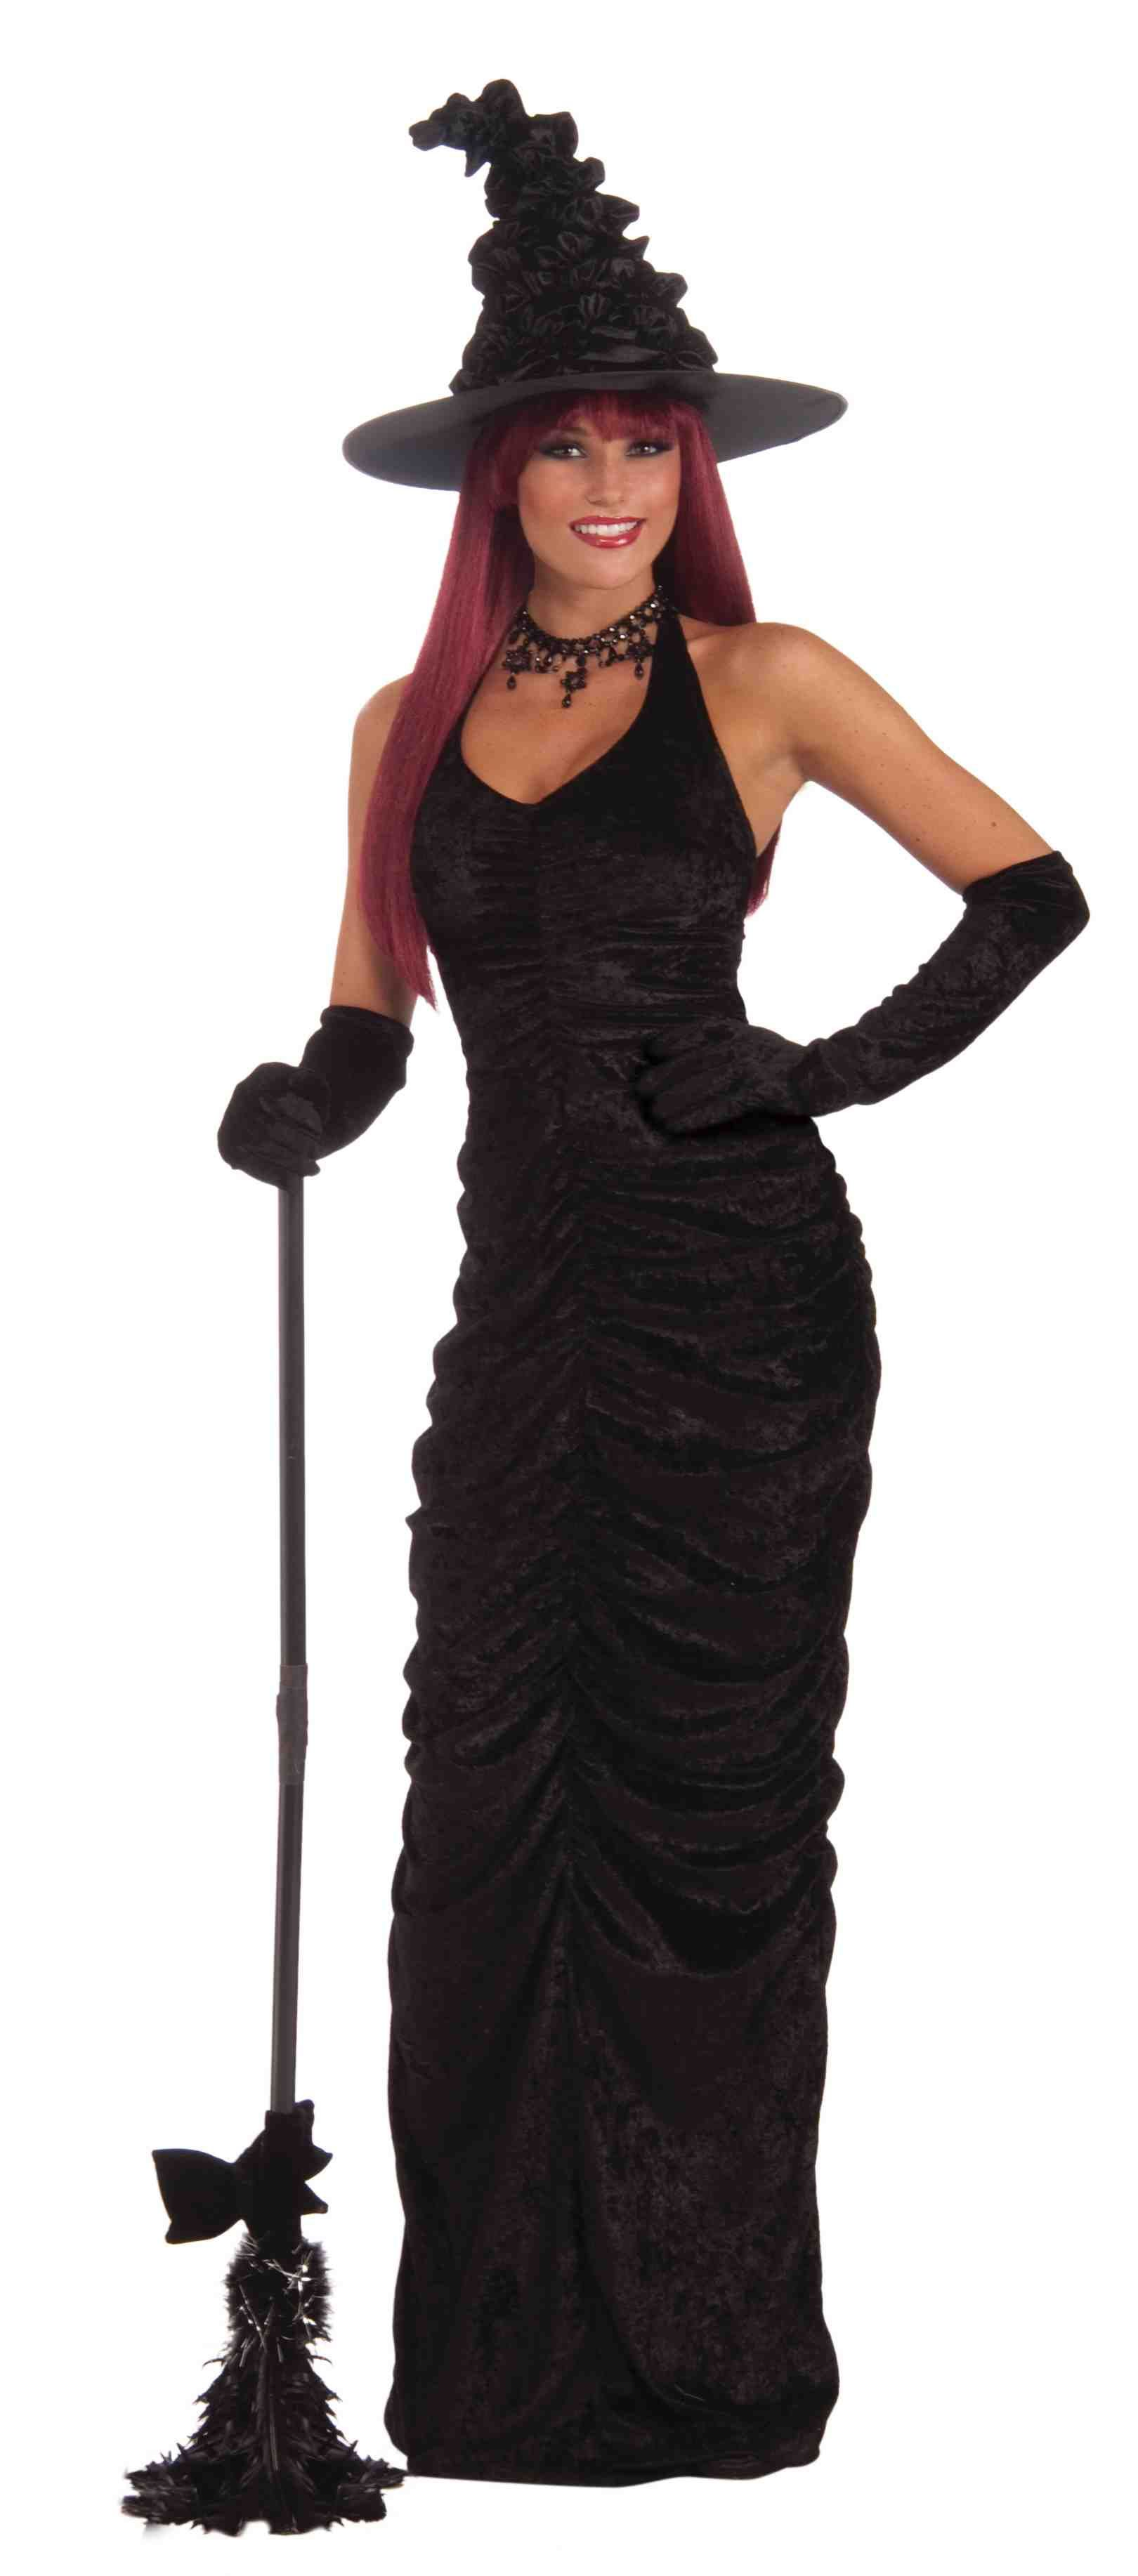 Black Magic Mistress Witch Costume | Witch costumes, Black magic ...